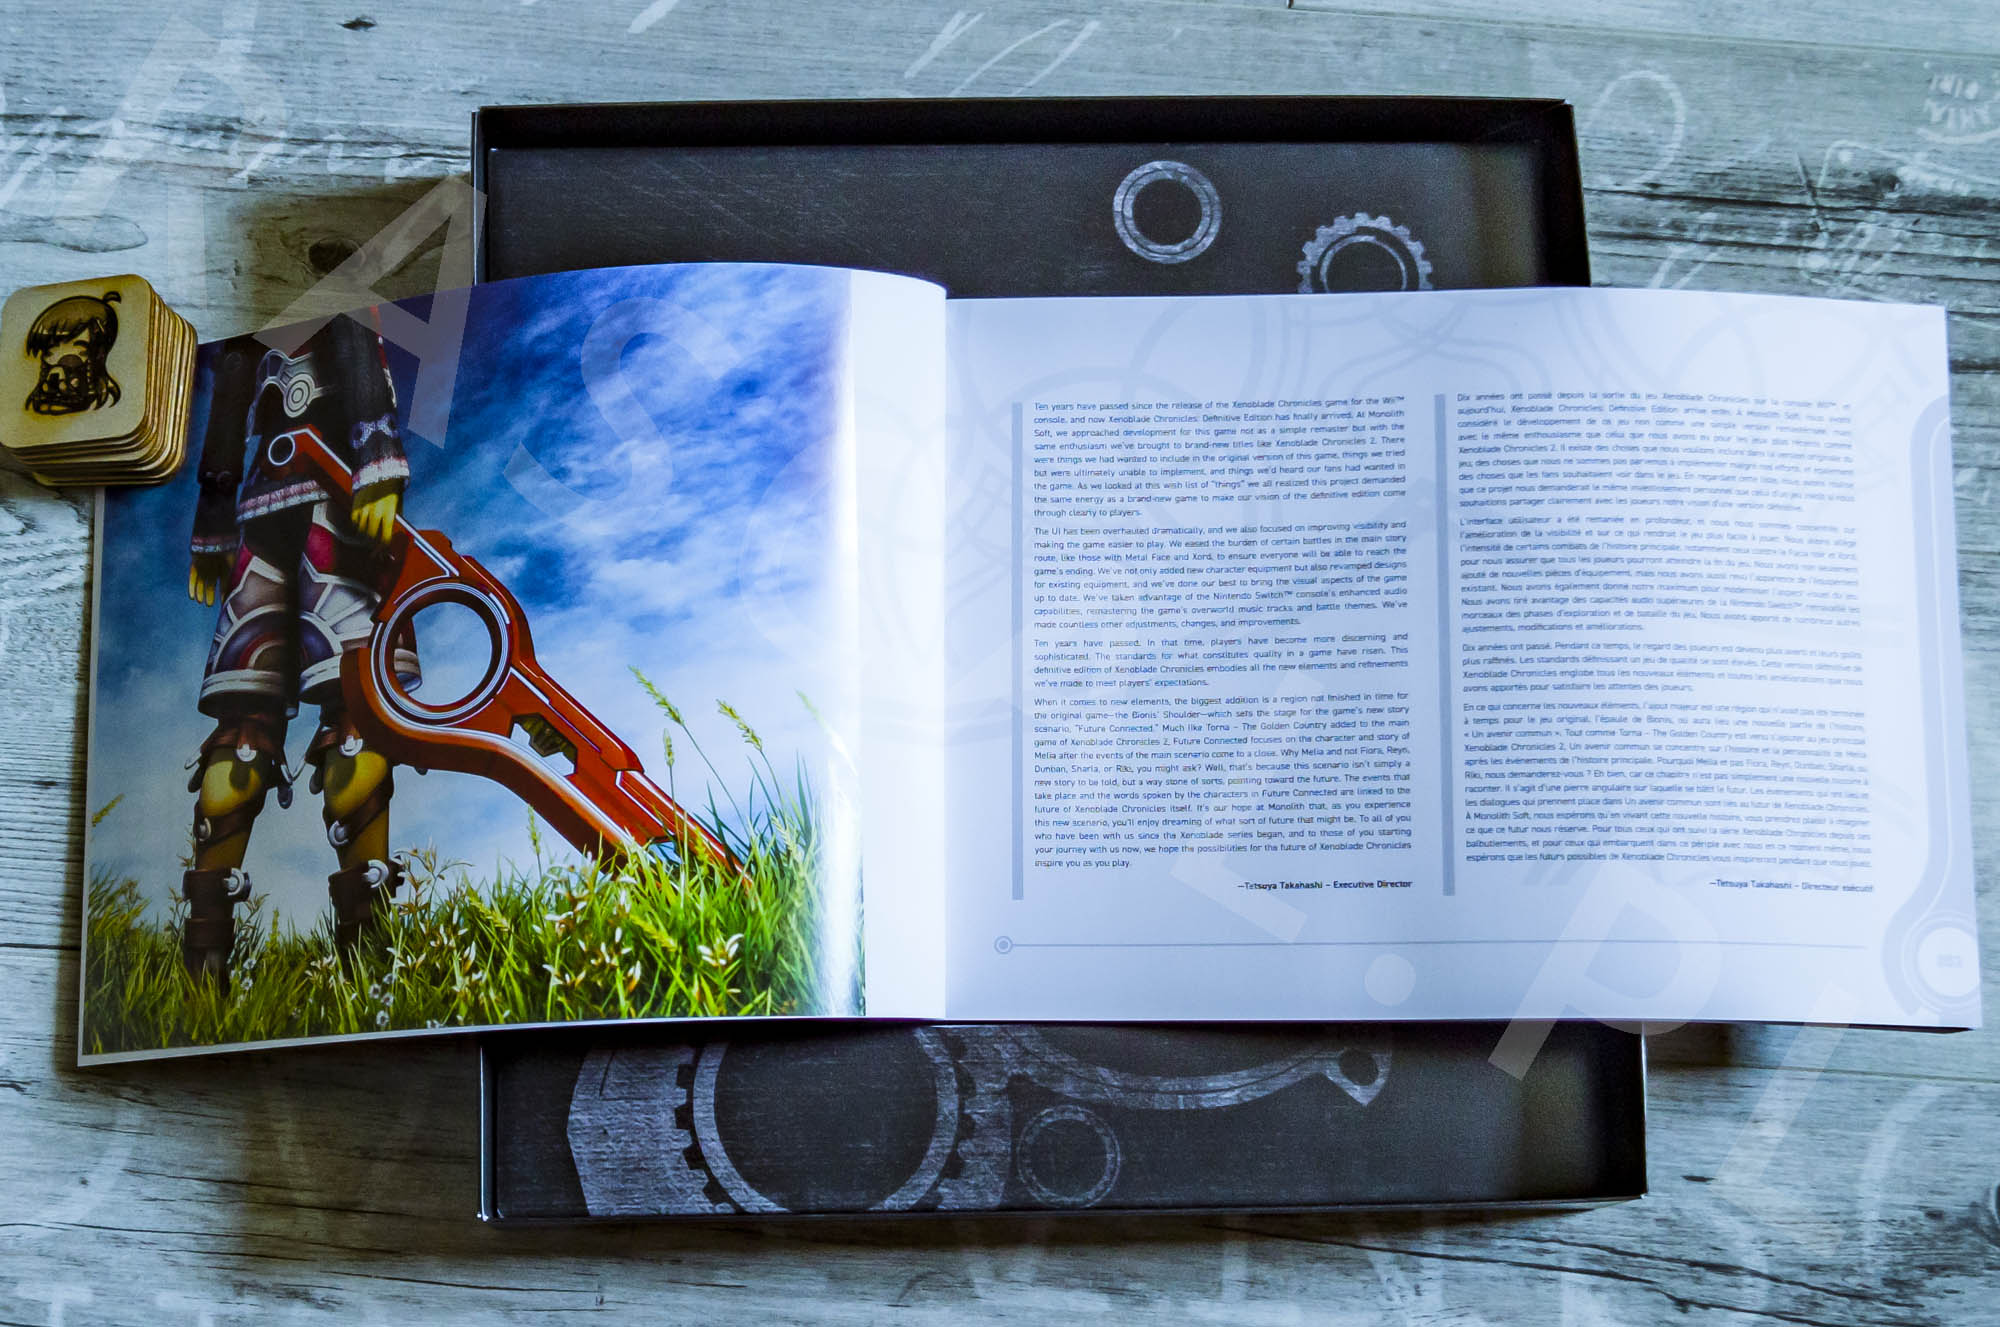 Xenoblade Chronicles Definitive Edition Collectors Set - Artbook - 01